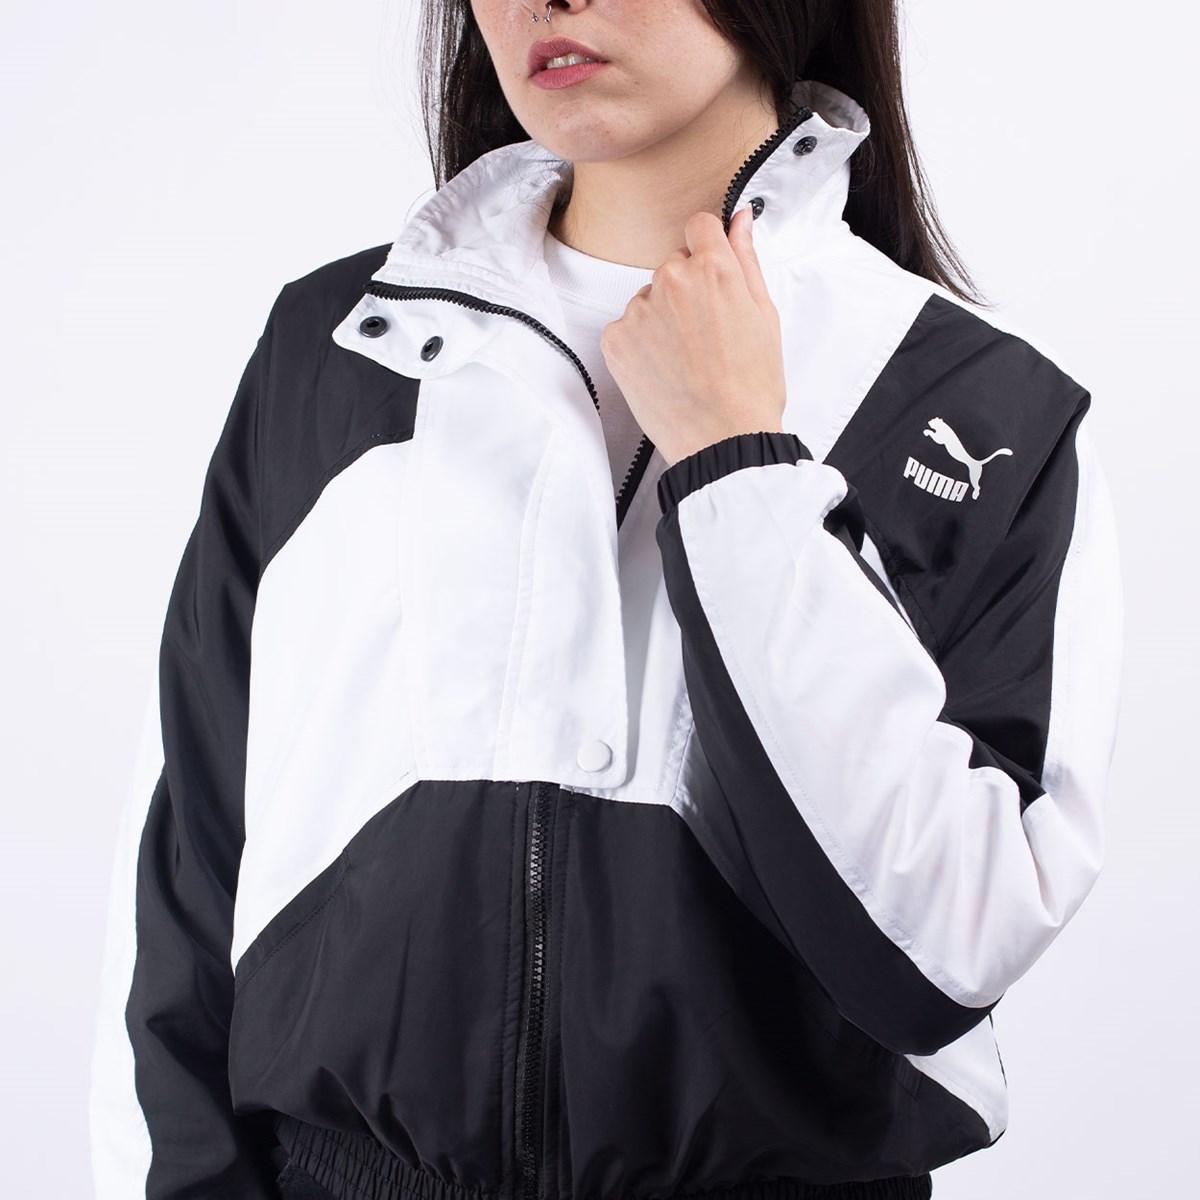 Jaqueta Puma Feminino TFS Woven Track Jacket Black 59629101